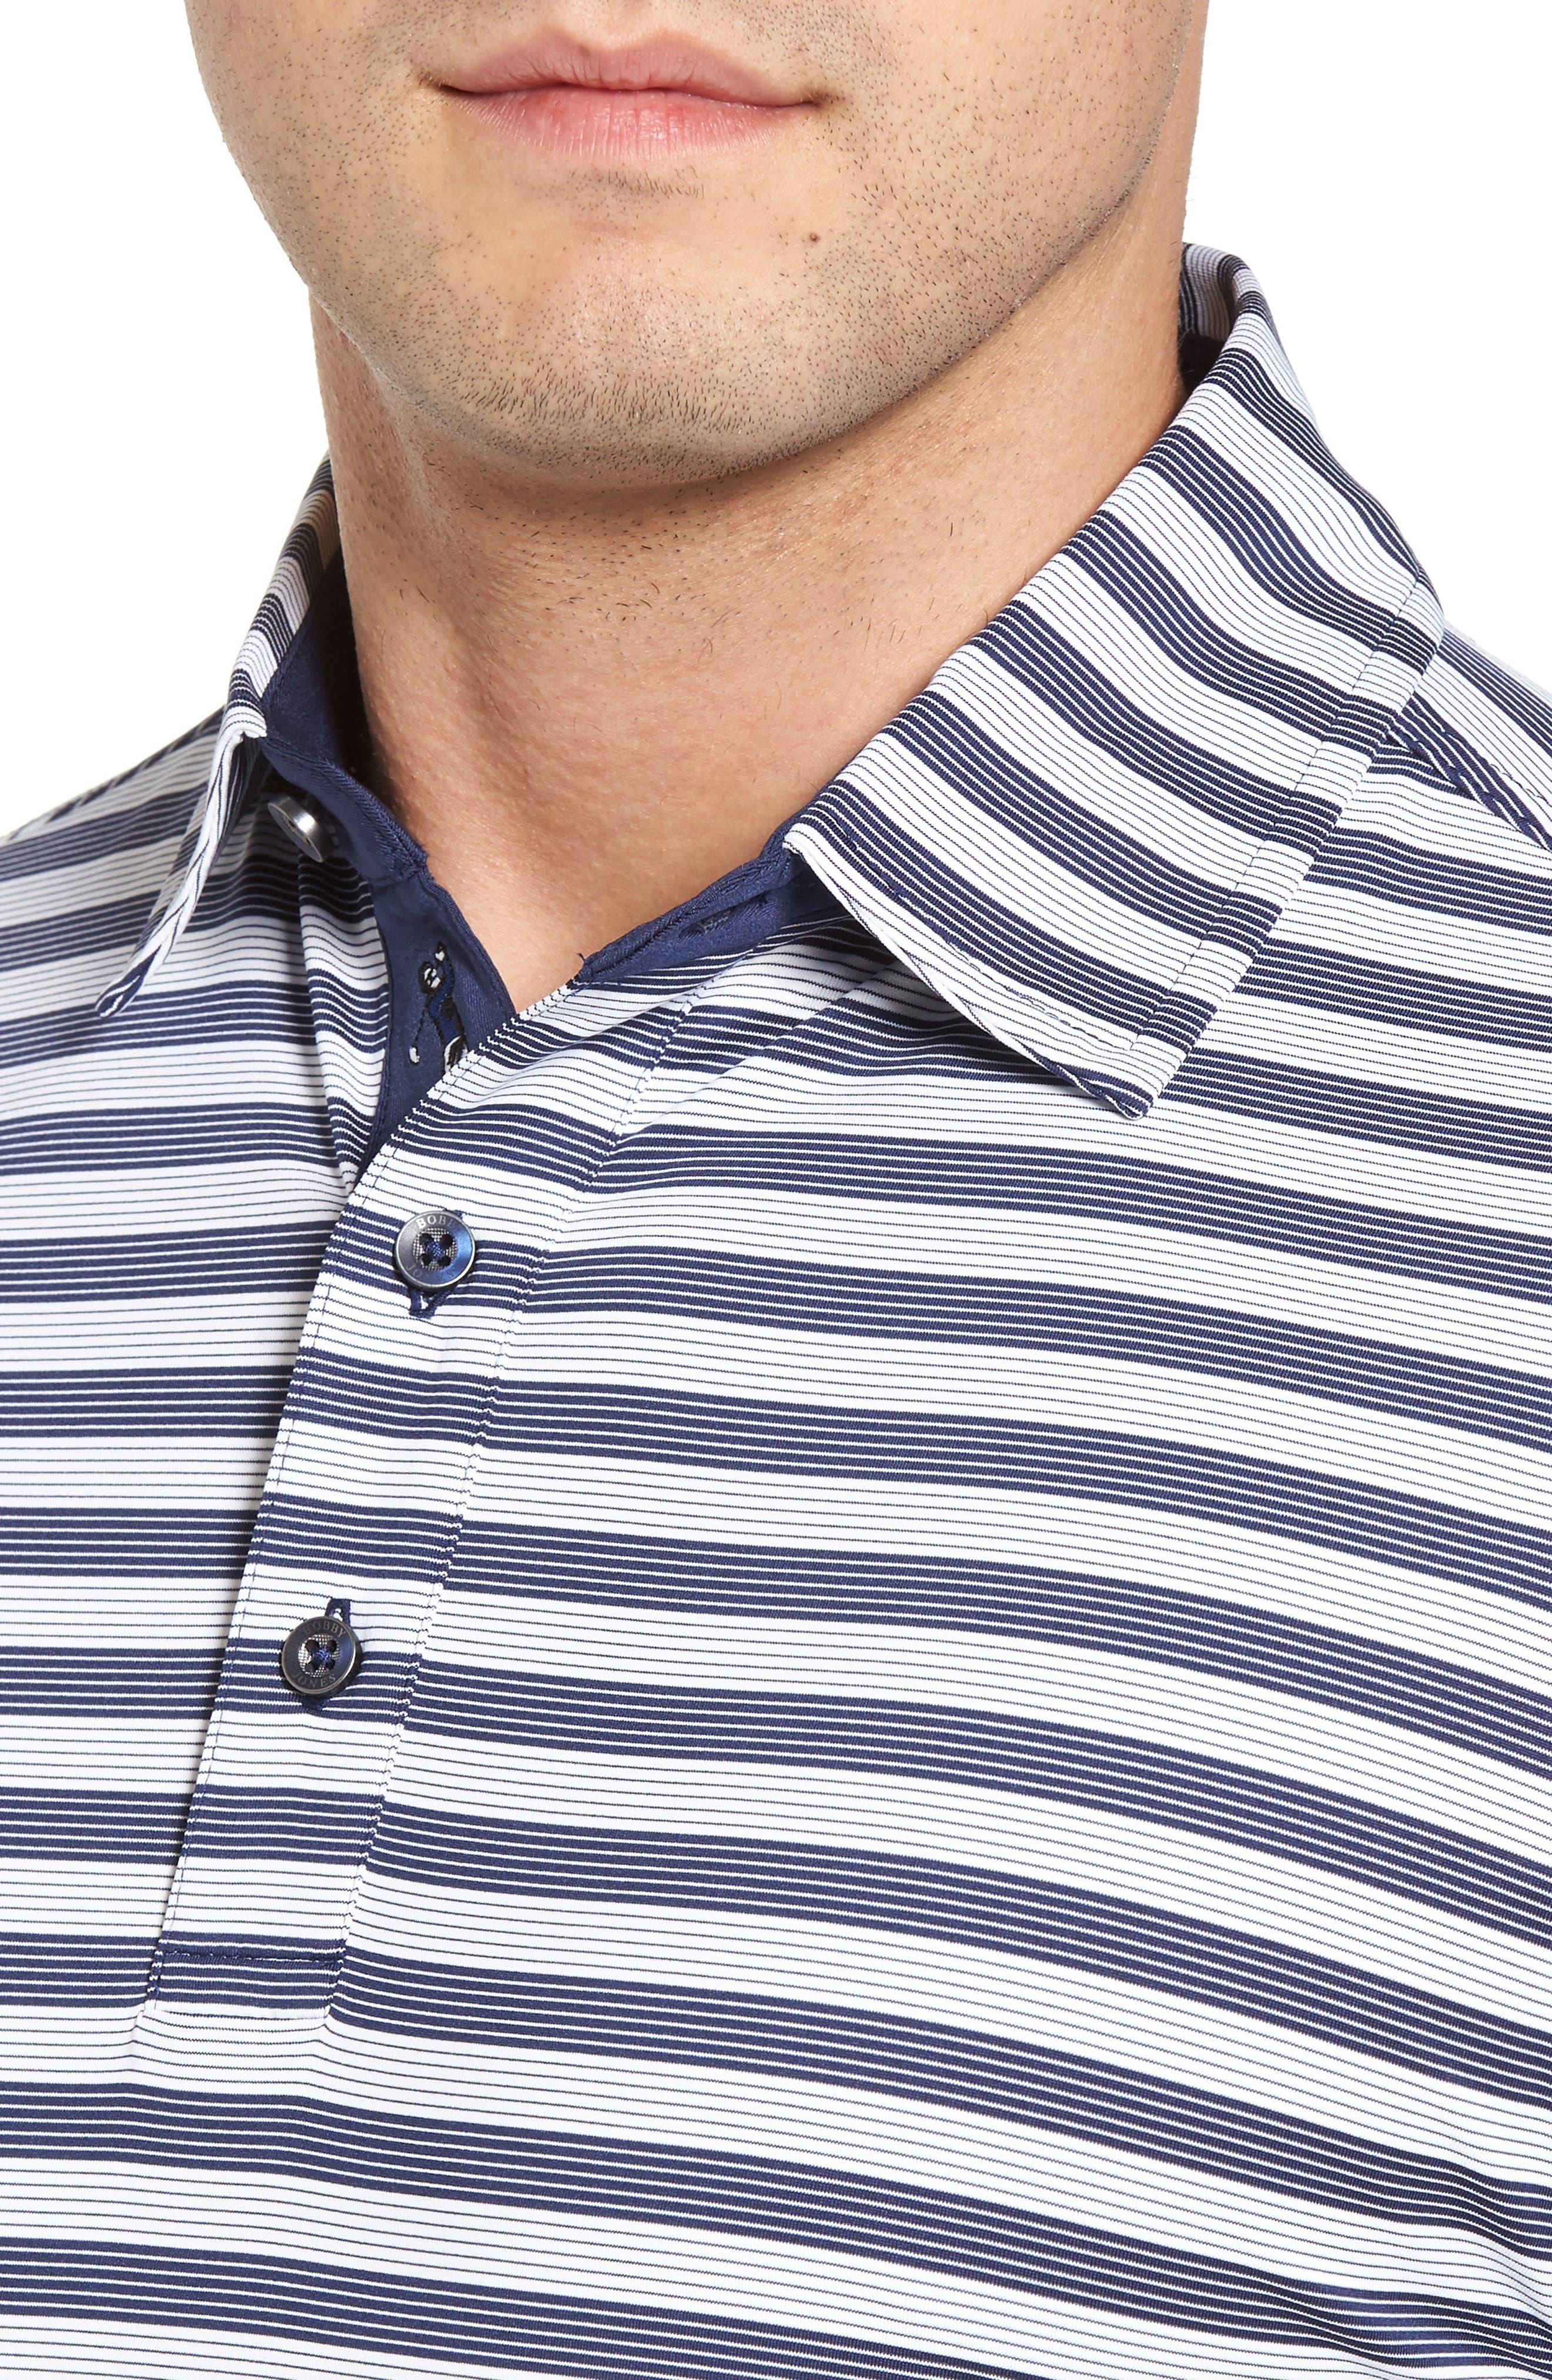 XH2O Del Mar Stripe Jersey Polo,                             Alternate thumbnail 4, color,                             400